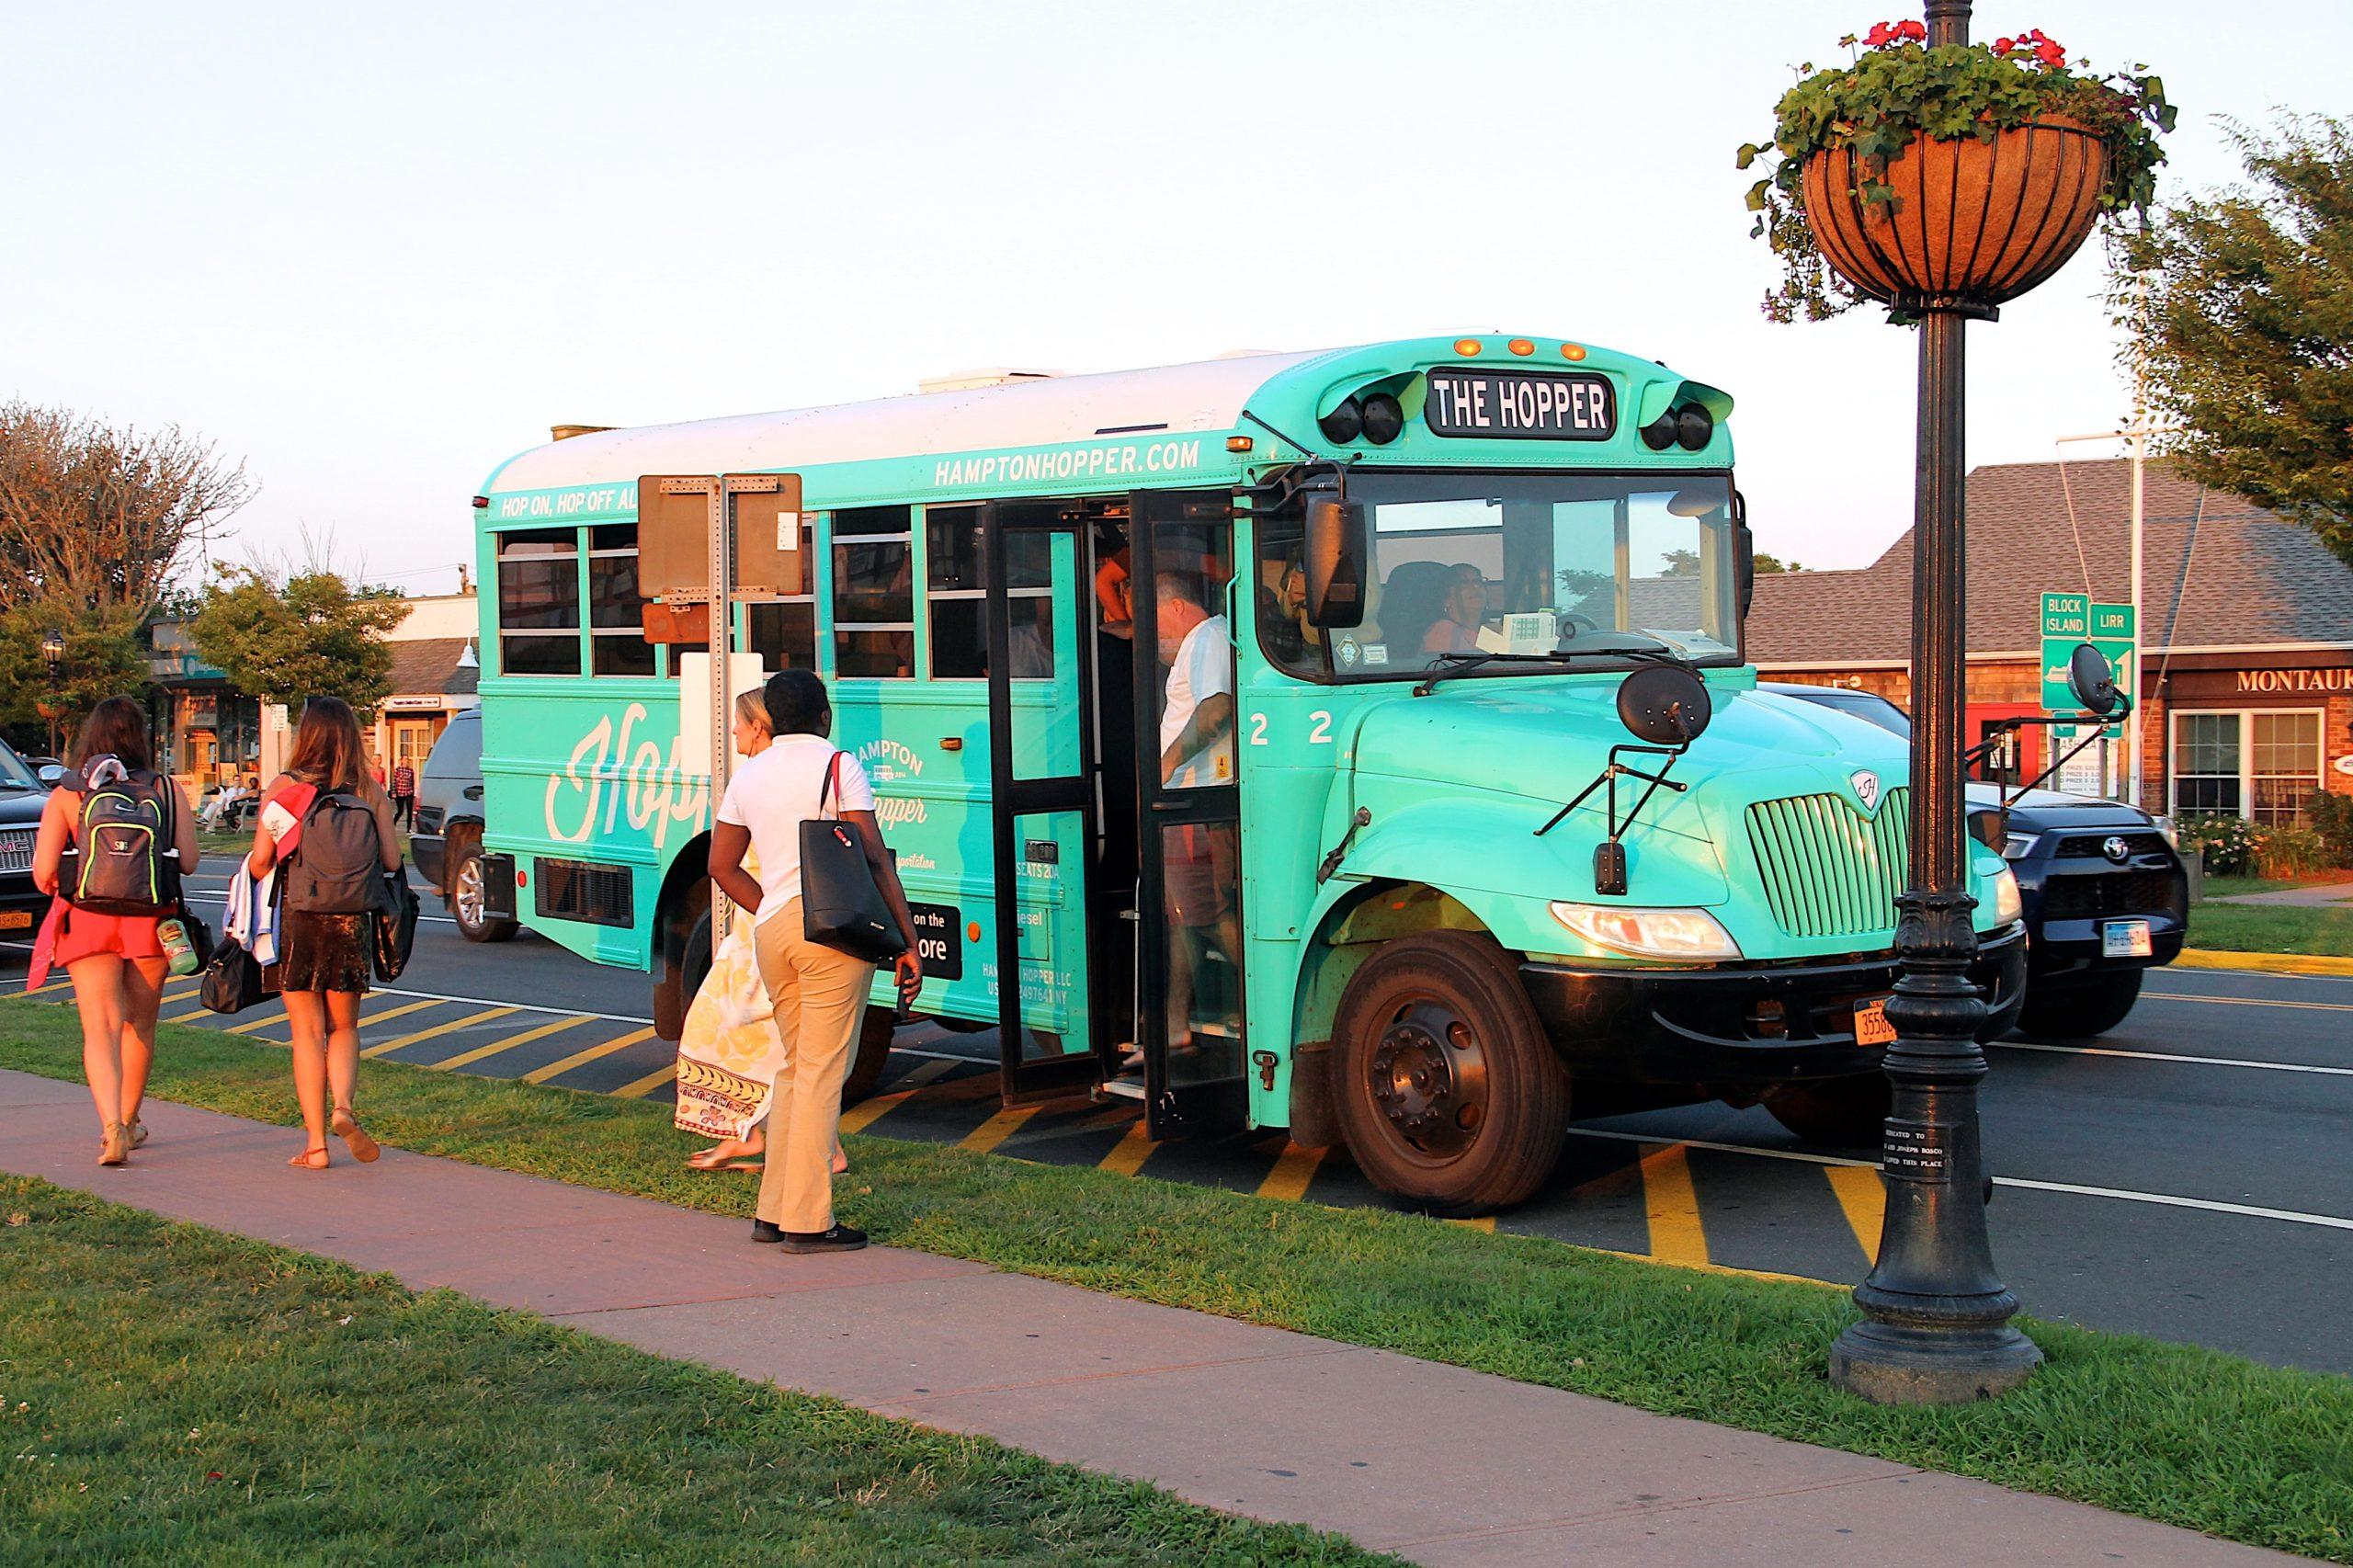 The Hampton Hopper's free bus service in Montauk will return this year.